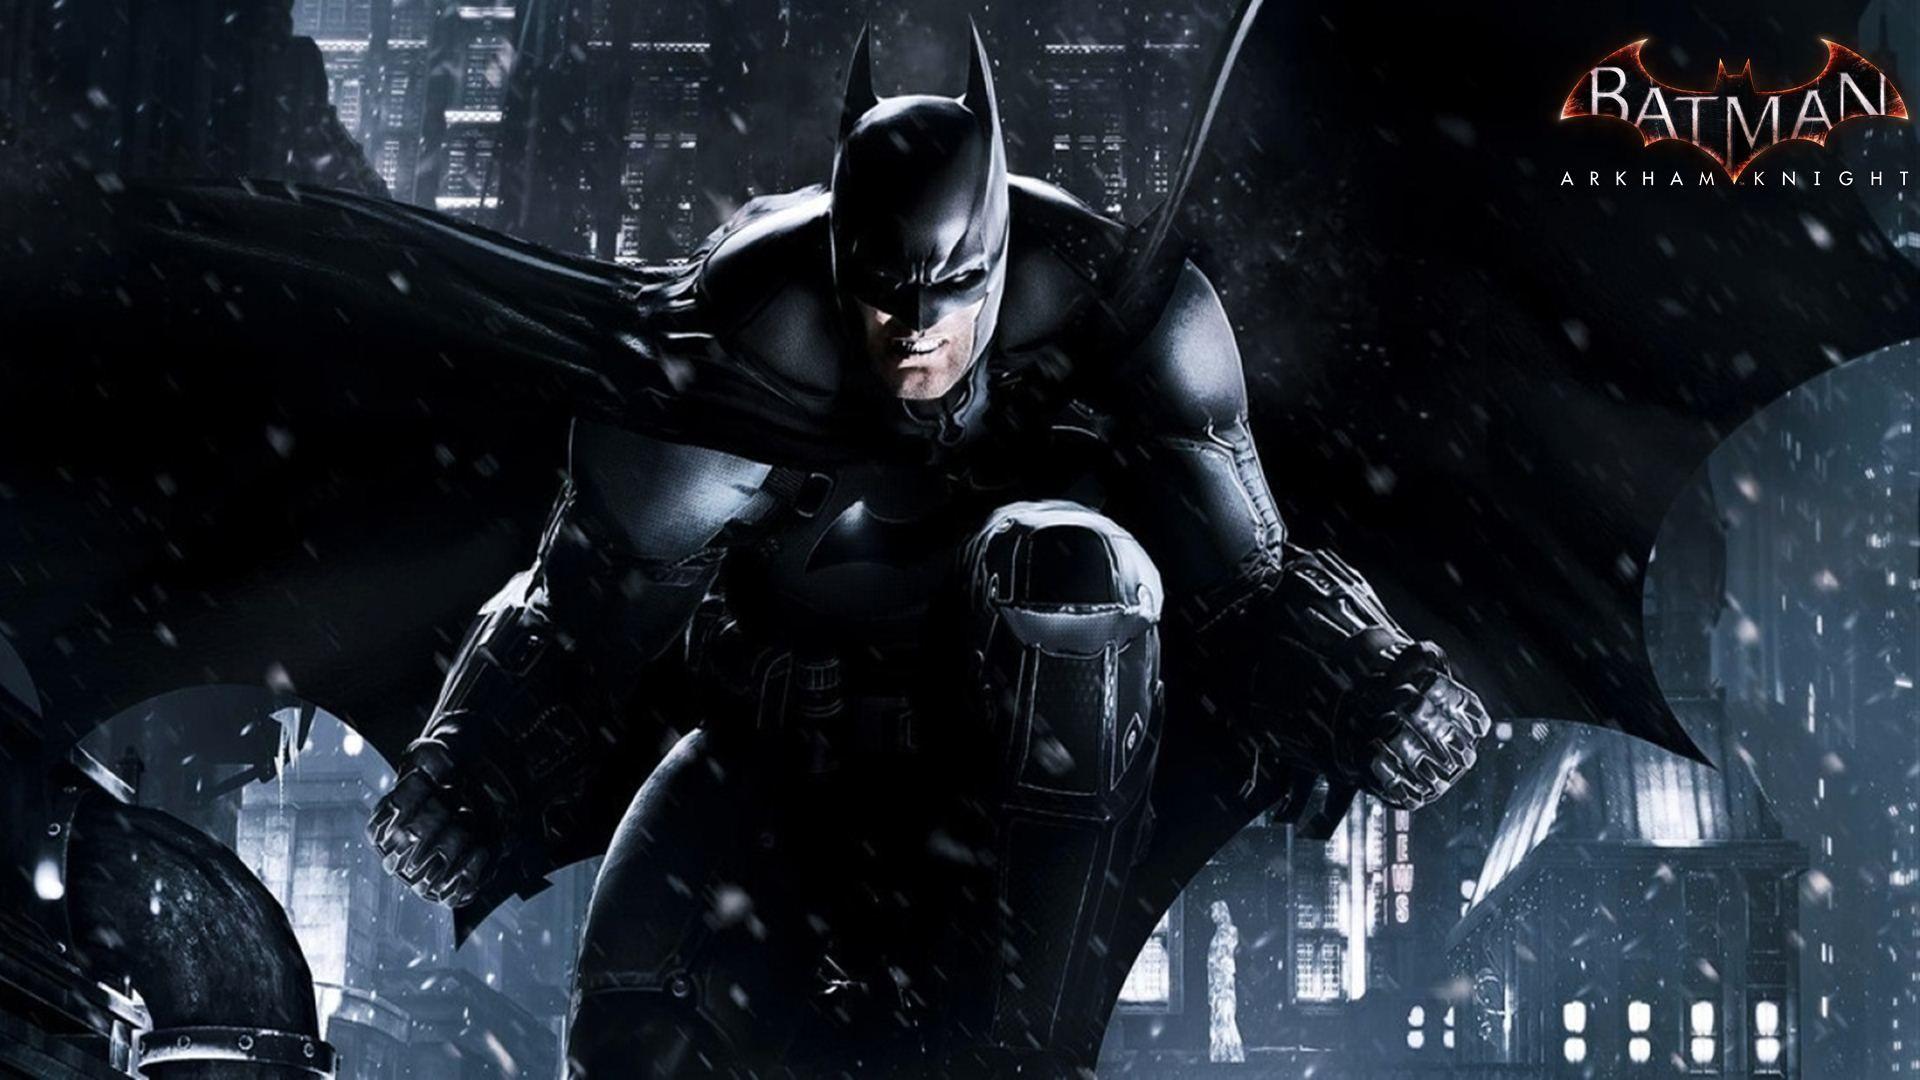 Batman Save Game Cheat Codes Game Reviews Gameforsave Com Imagens Batman Arkham Origins